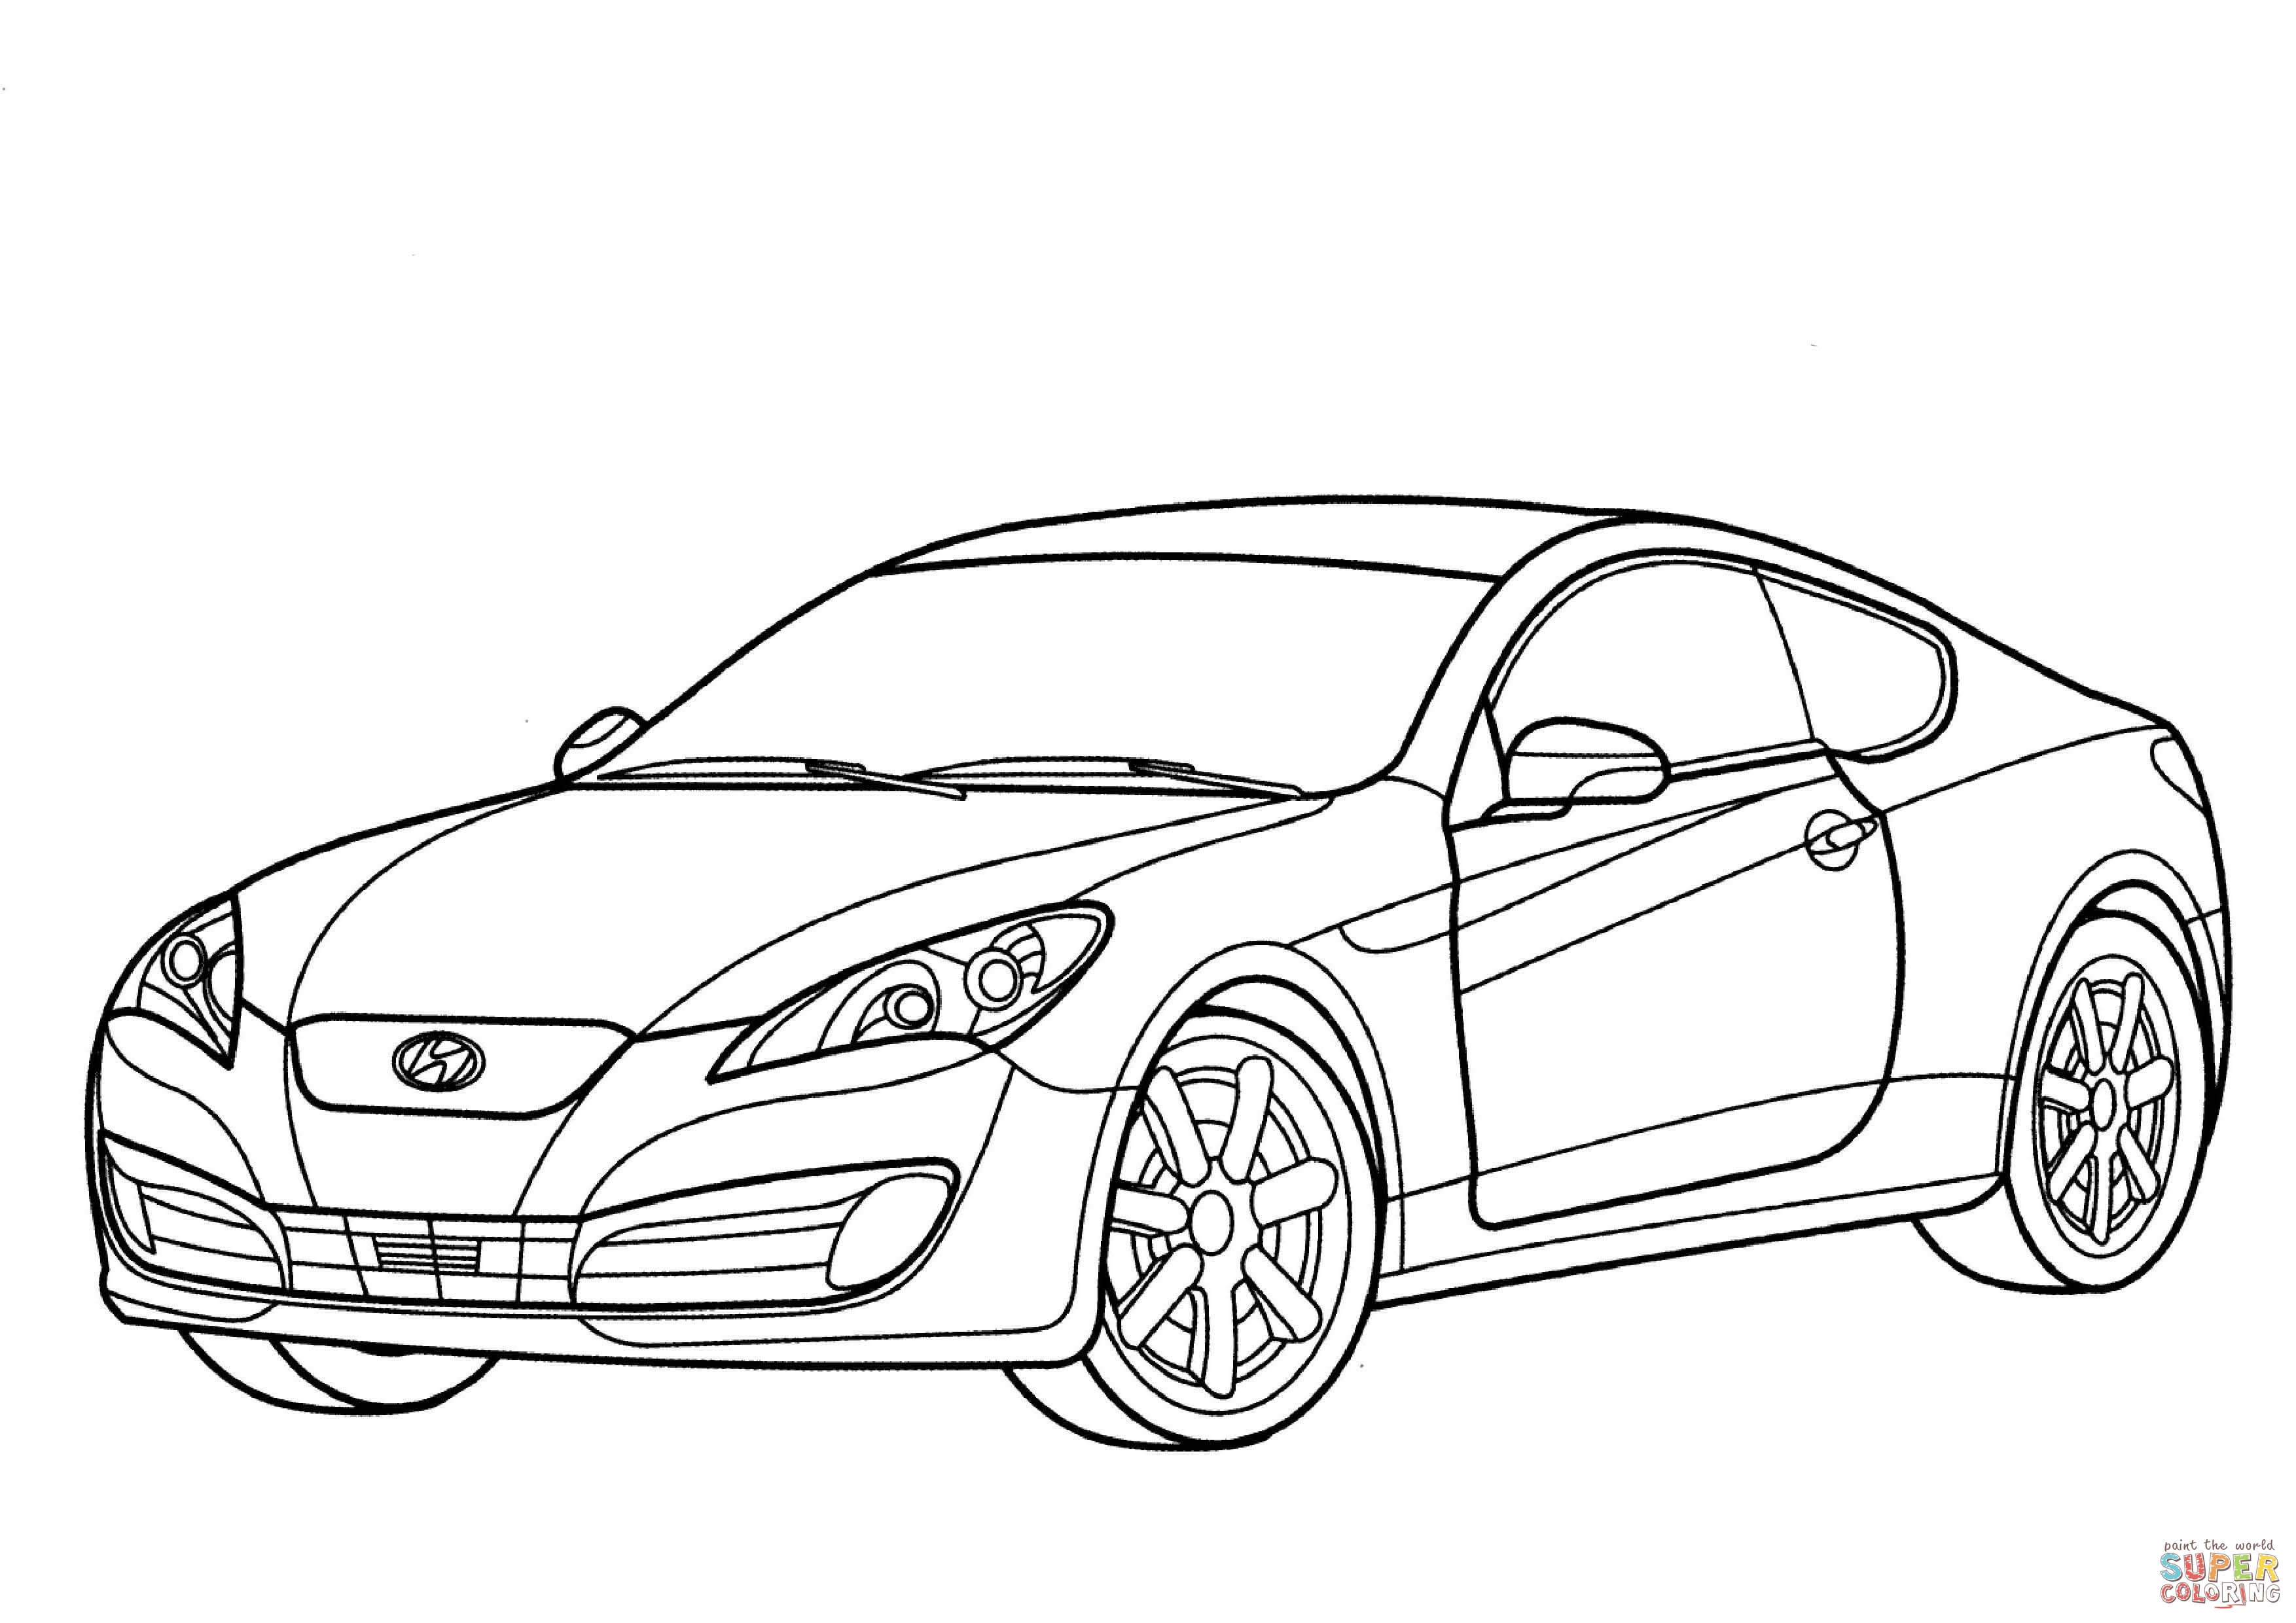 Fast Cars Drawing At Getdrawings